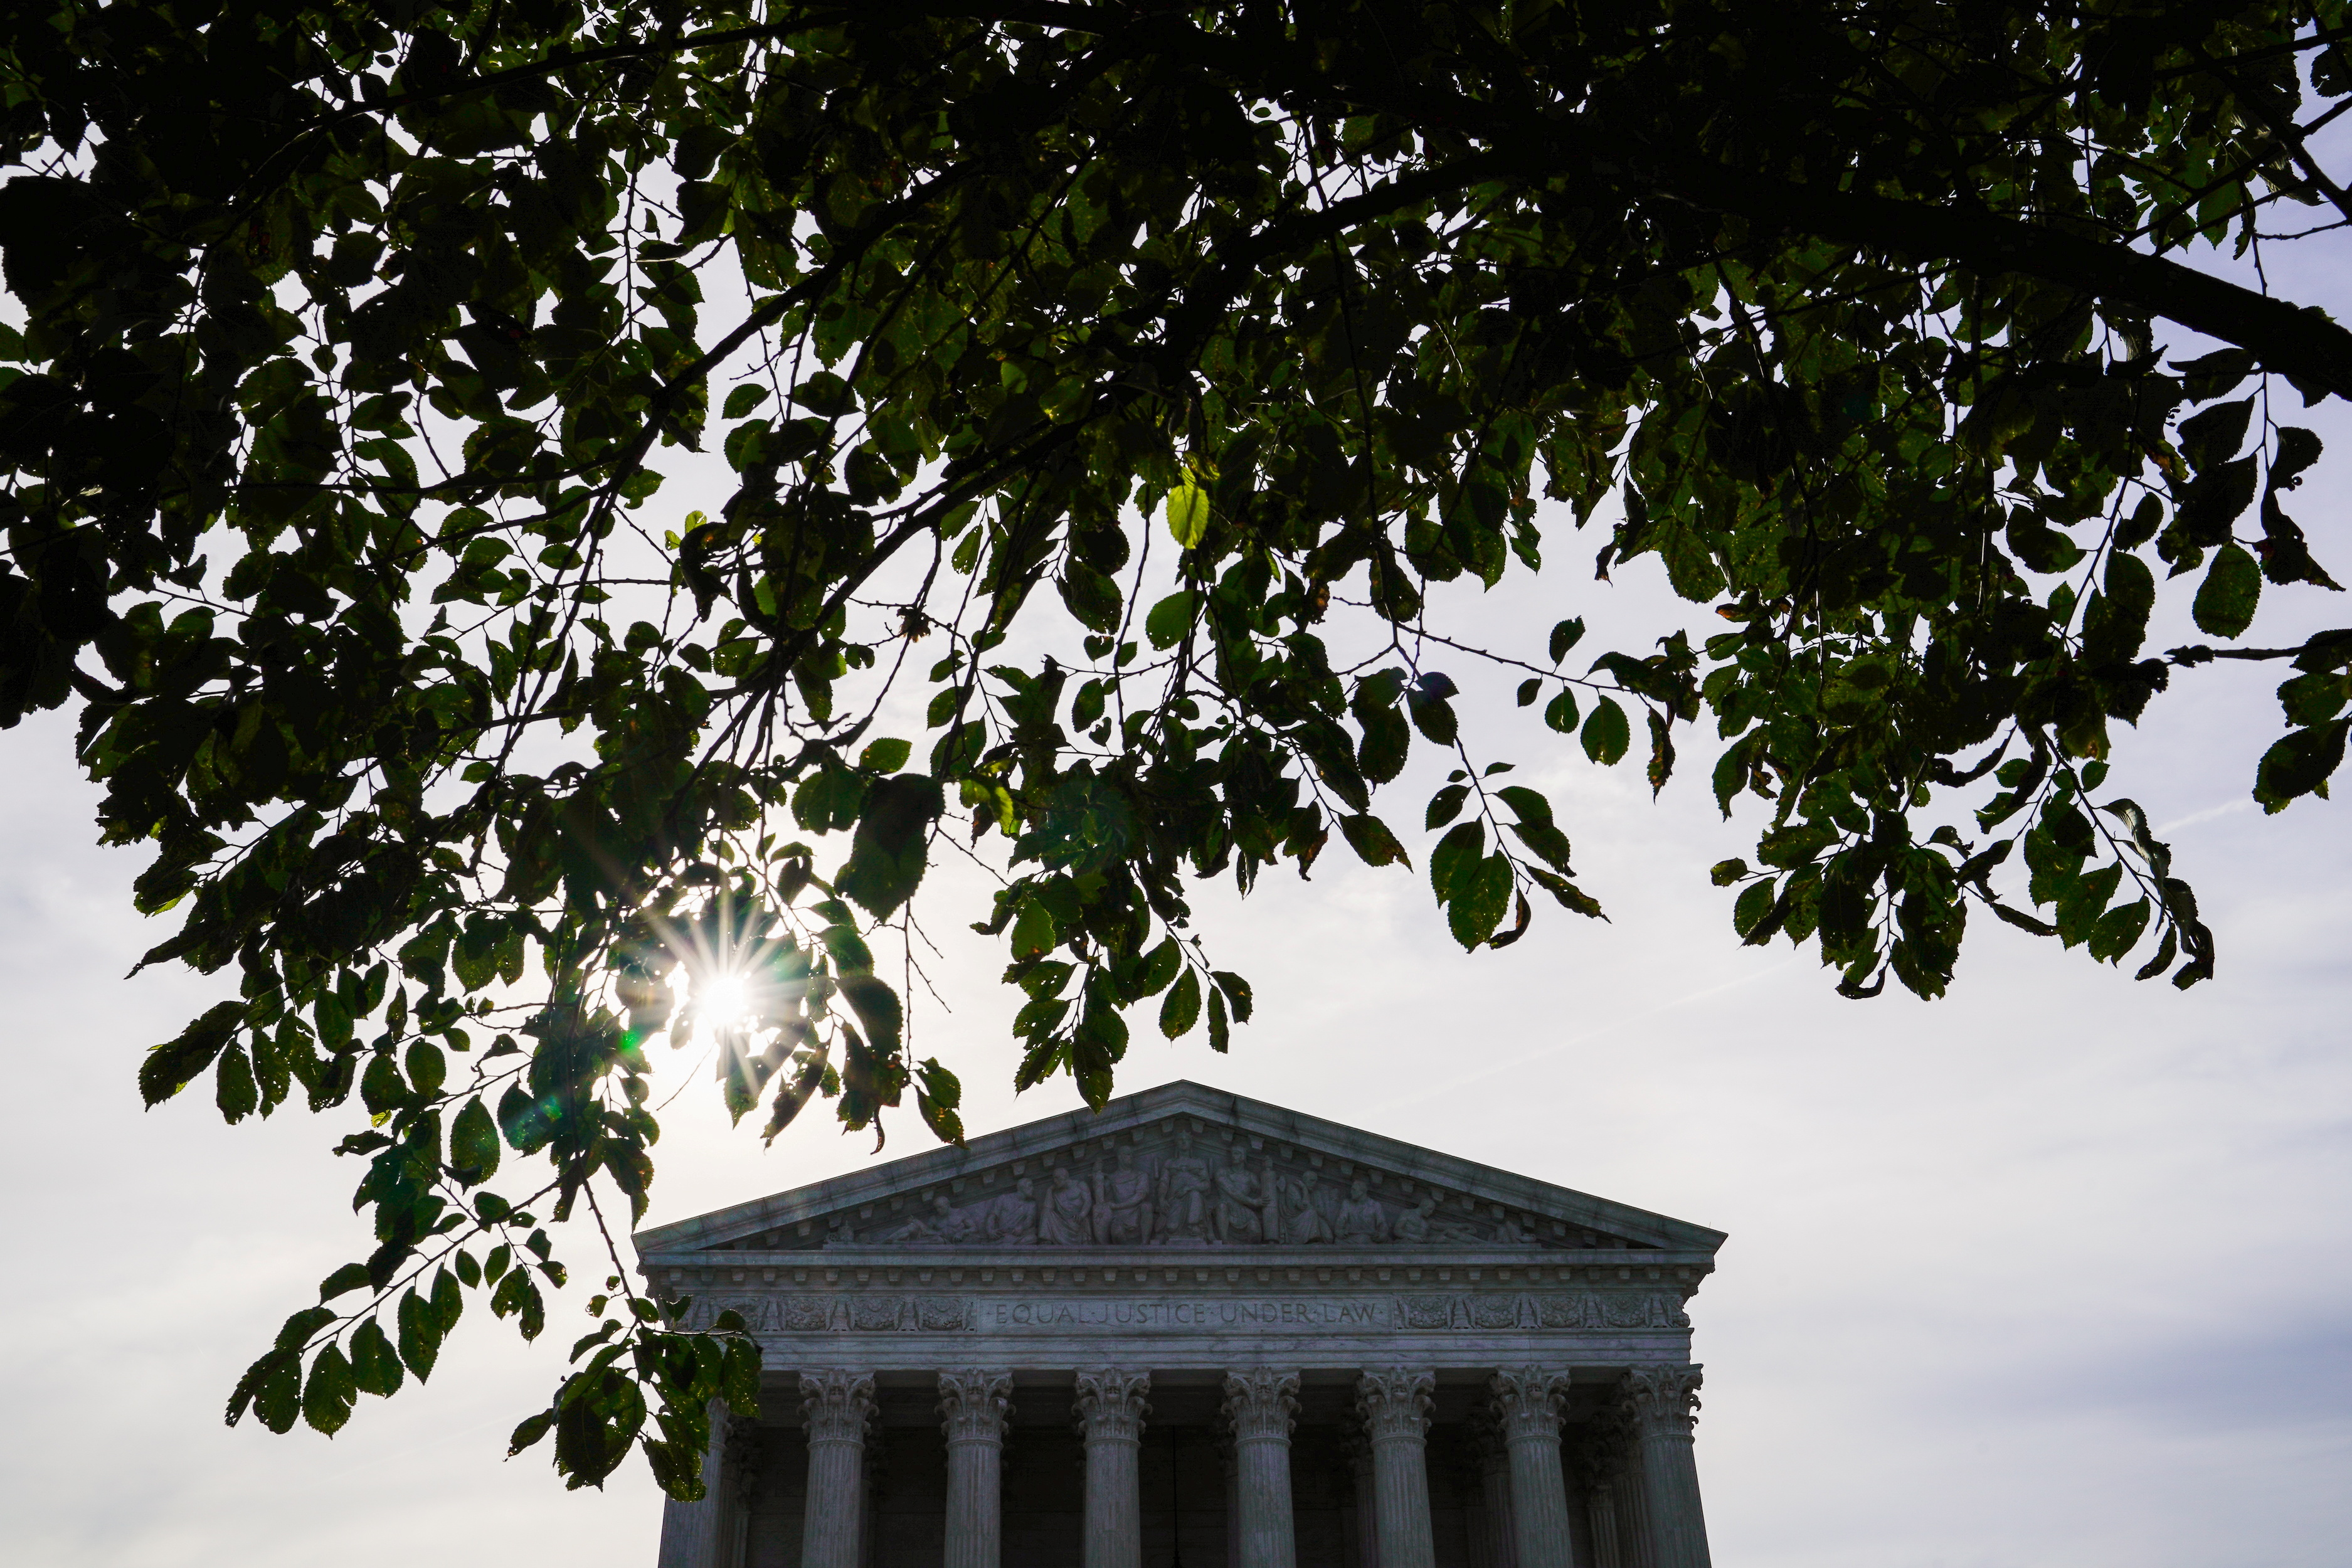 The sun rises behind the U.S. Supreme Court in Washington, U.S., June 1, 2021. REUTERS/Erin Scott